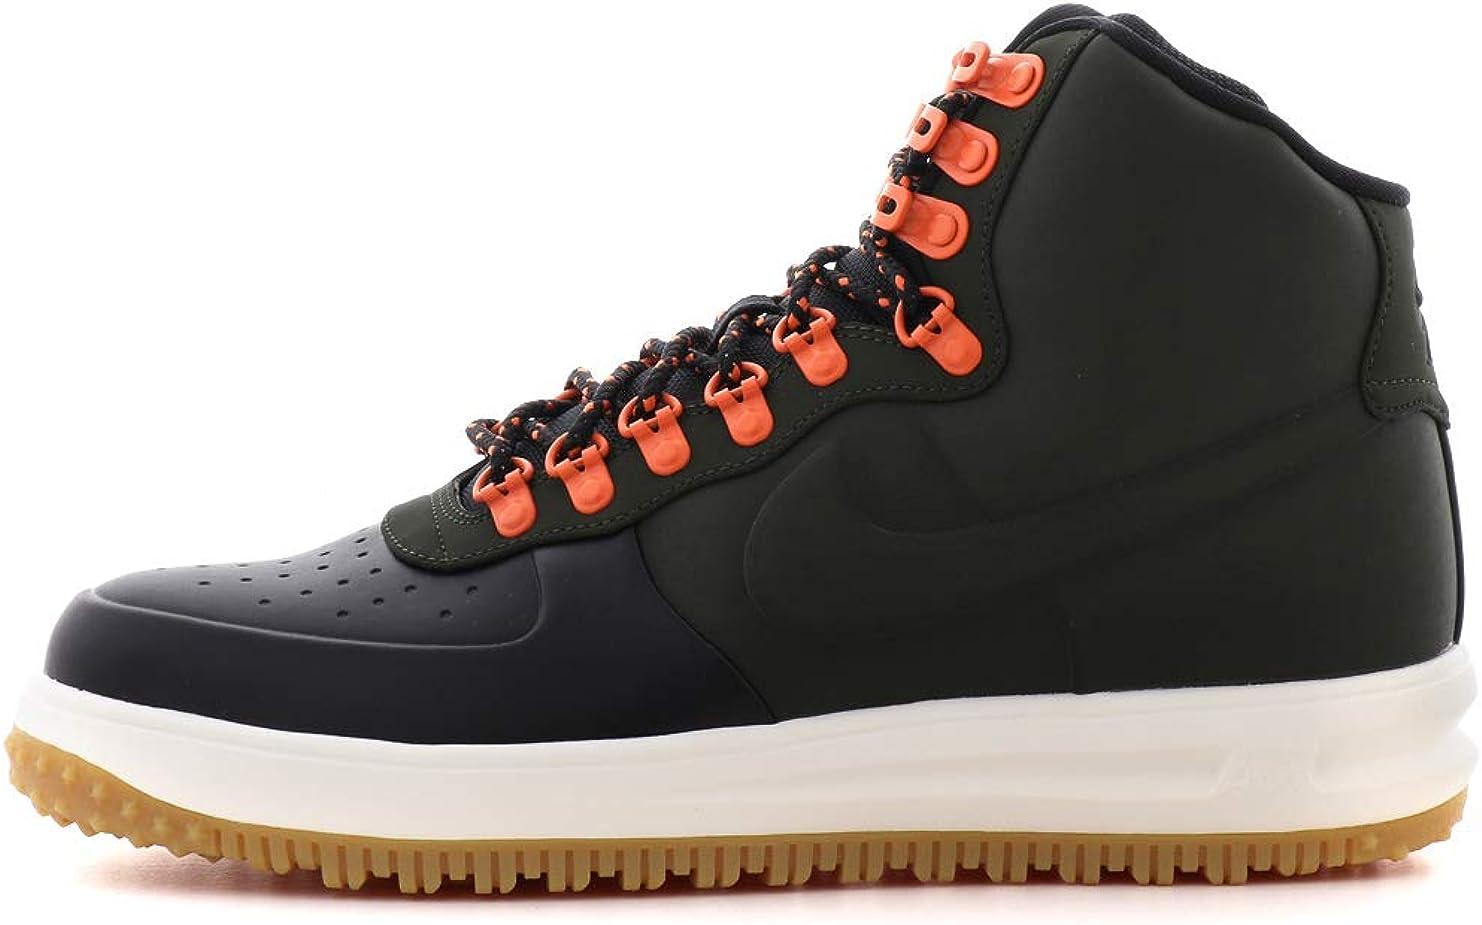 Nike Mens Lunar Force 1 Duckboot Boot